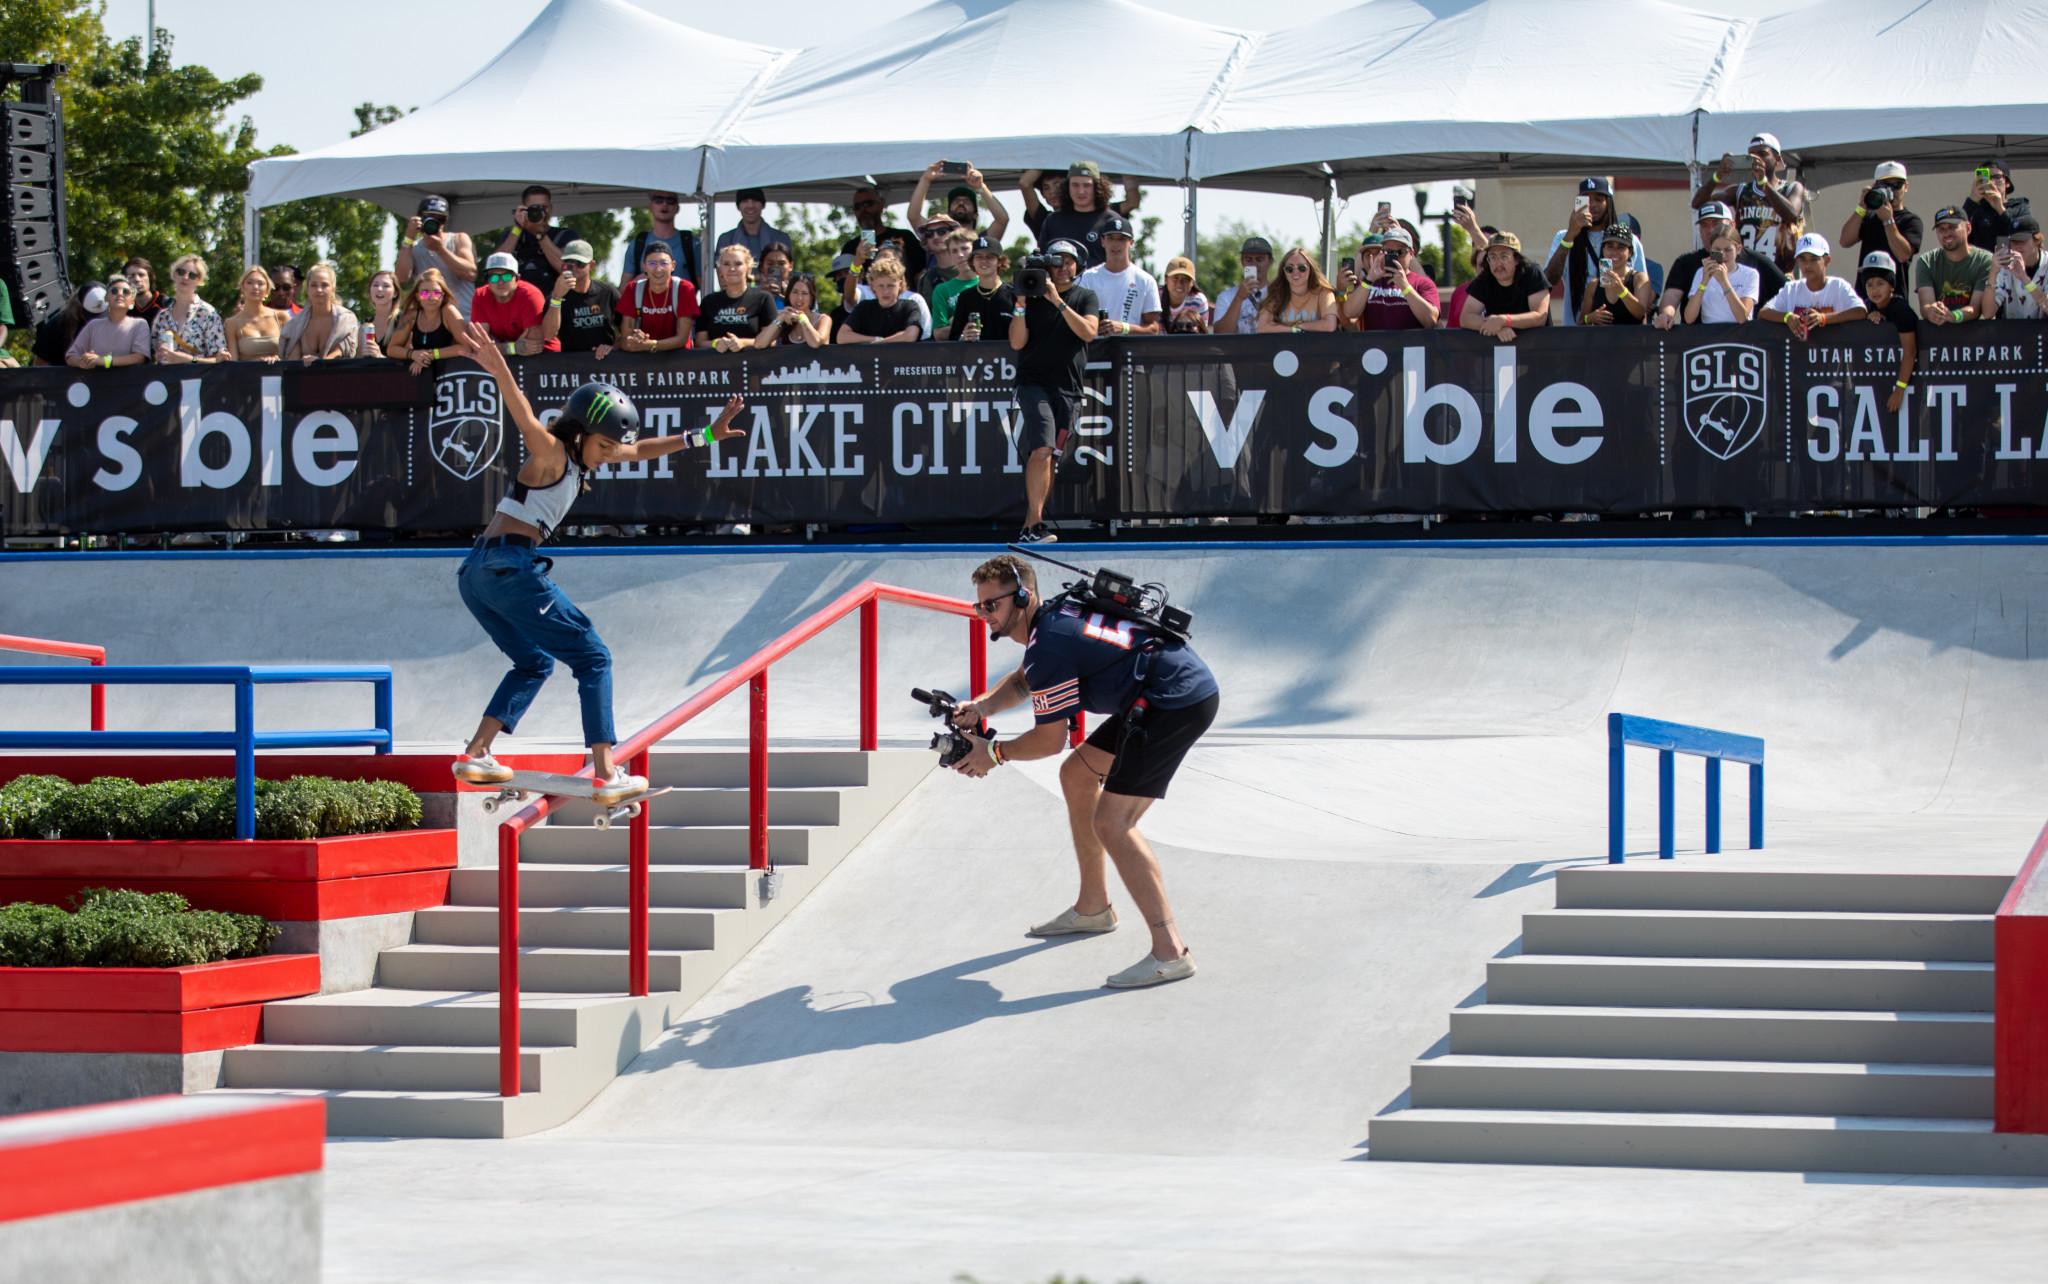 Leal and Ribeiro win season-opening SLS Championship Tour contest in Salt Lake City